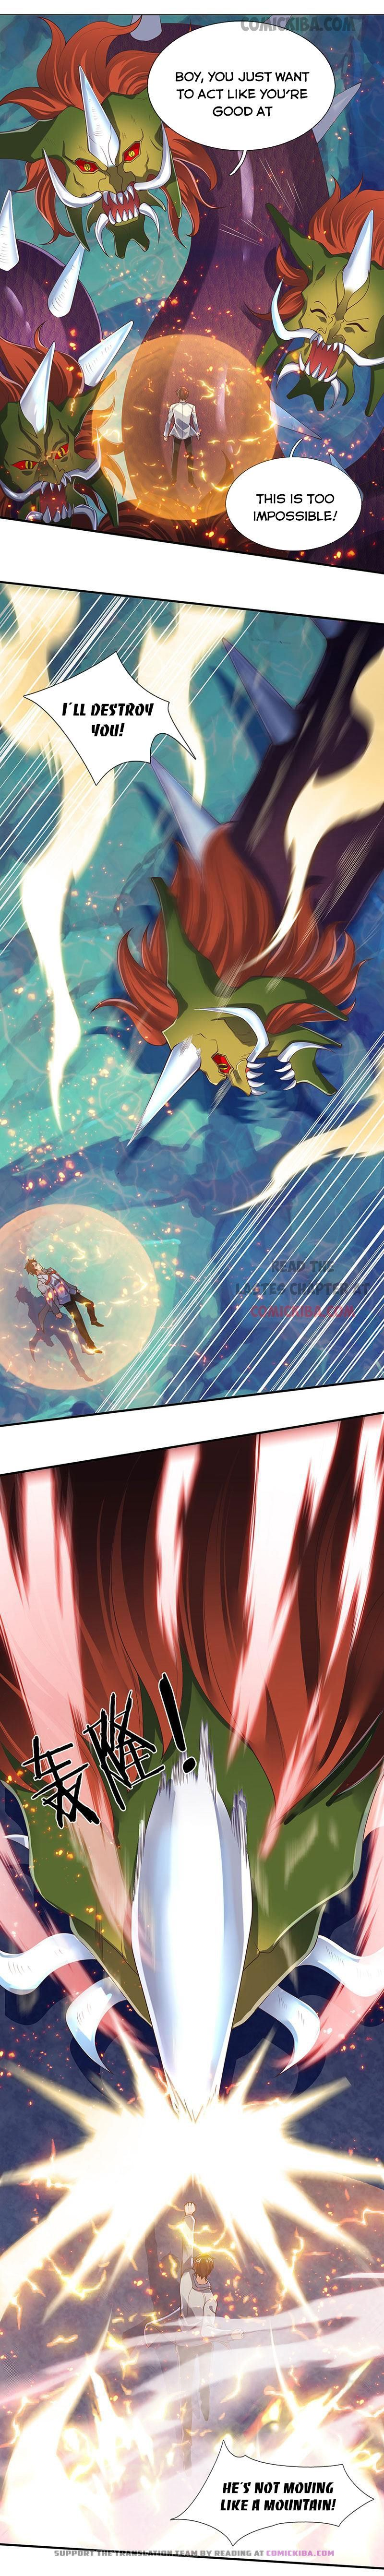 https://manga.mangadogs.com/comics/pic4/39/32615/2704839/097479d81eef69b77fc1e5ac6345a8d5.jpg Page 1